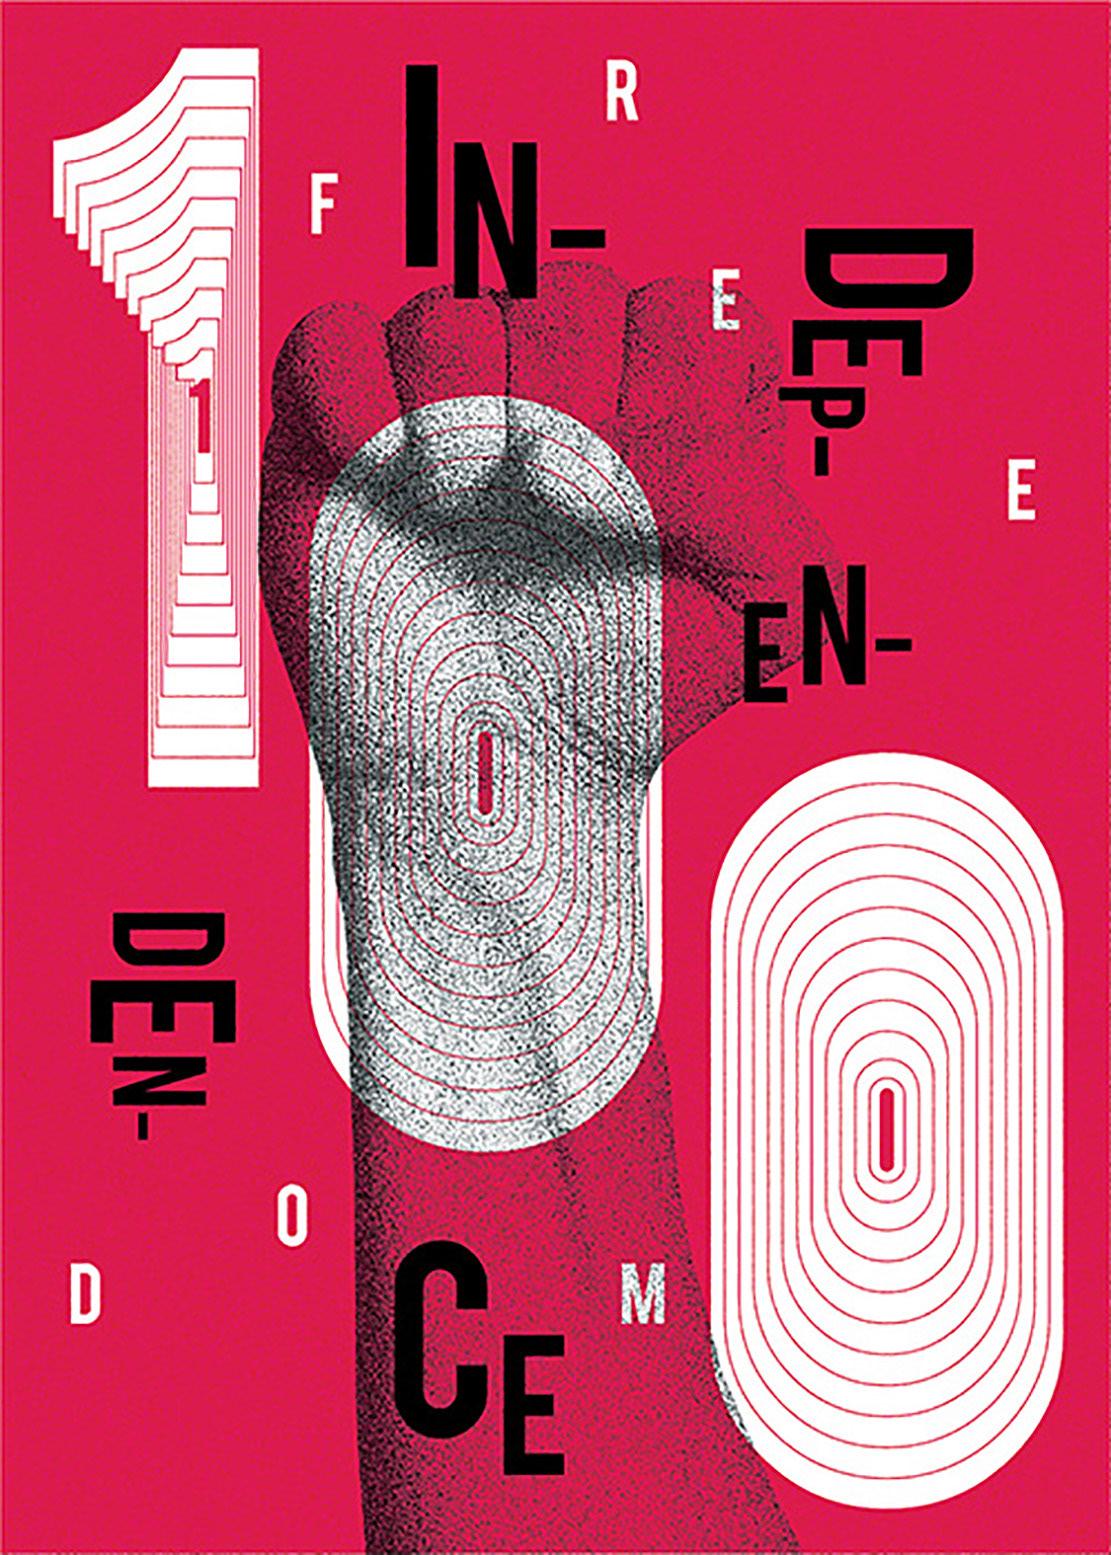 Independence freedom poland poster graphic design  hungary Ecuador